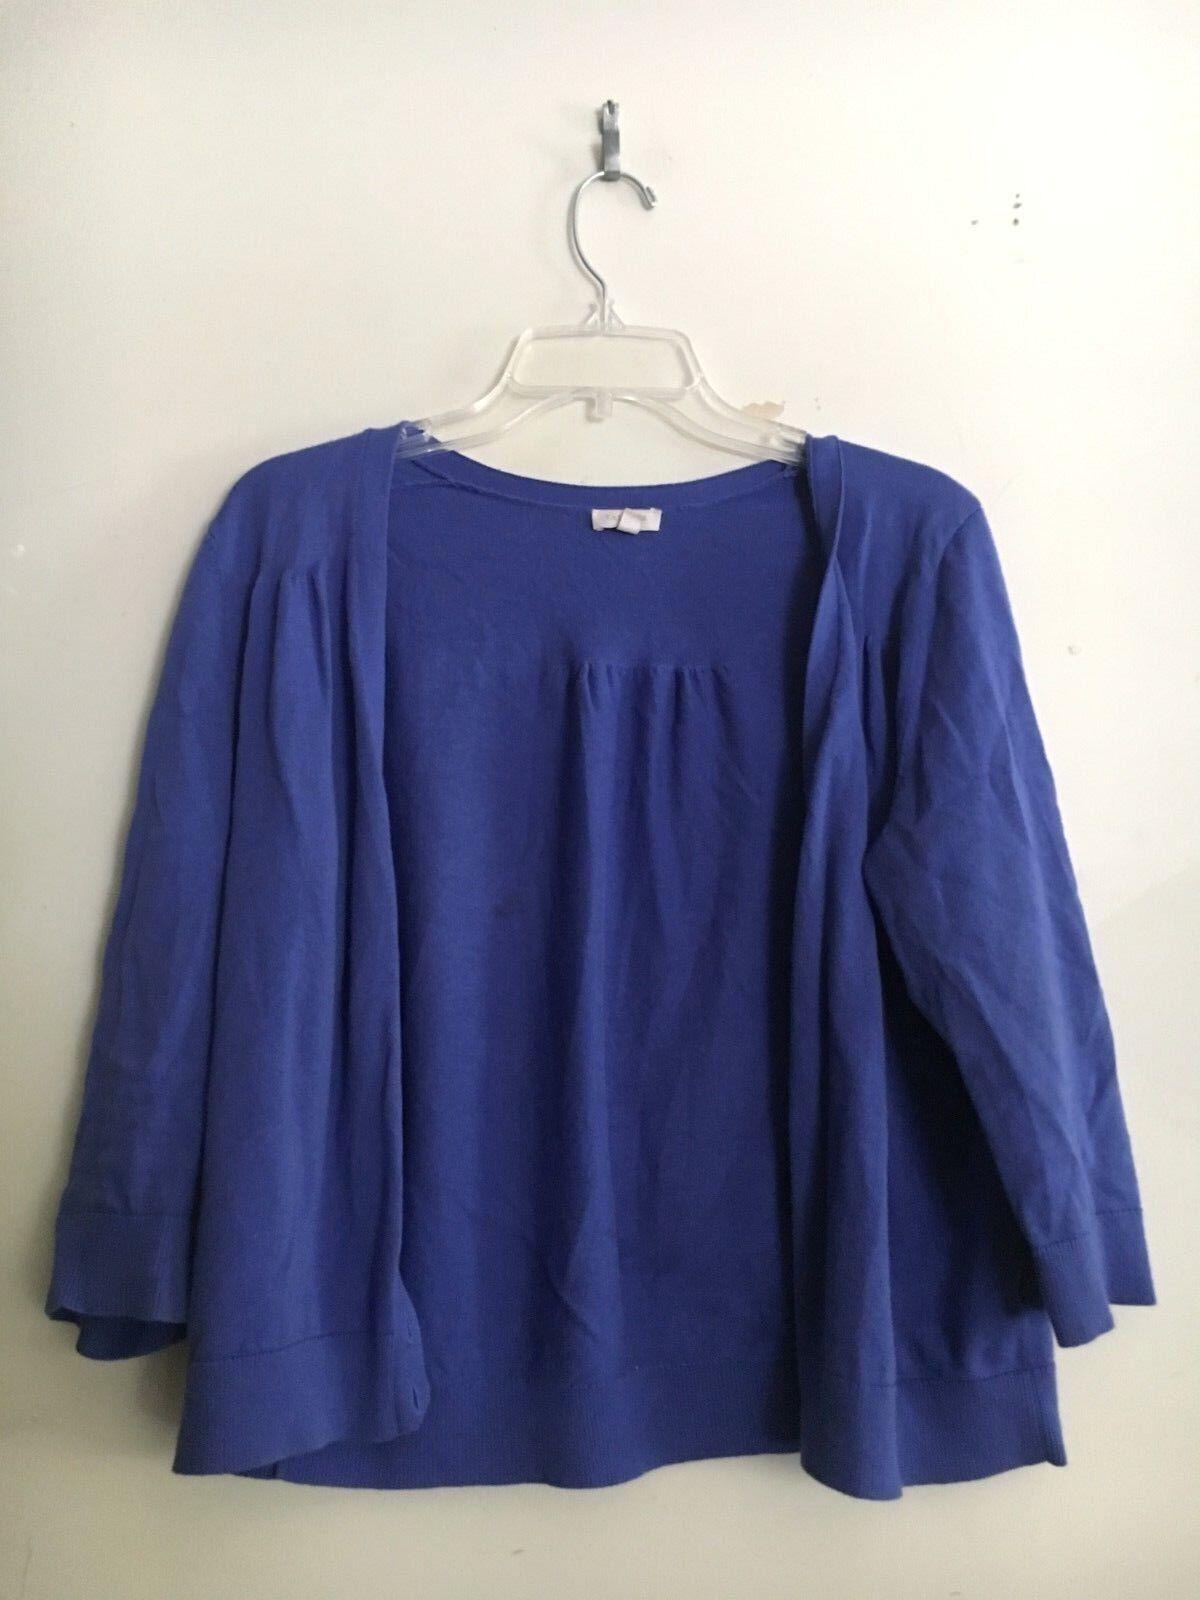 Talbots 100% Cotton Lavender Indigo Cardigan Sweater Women Size M CA